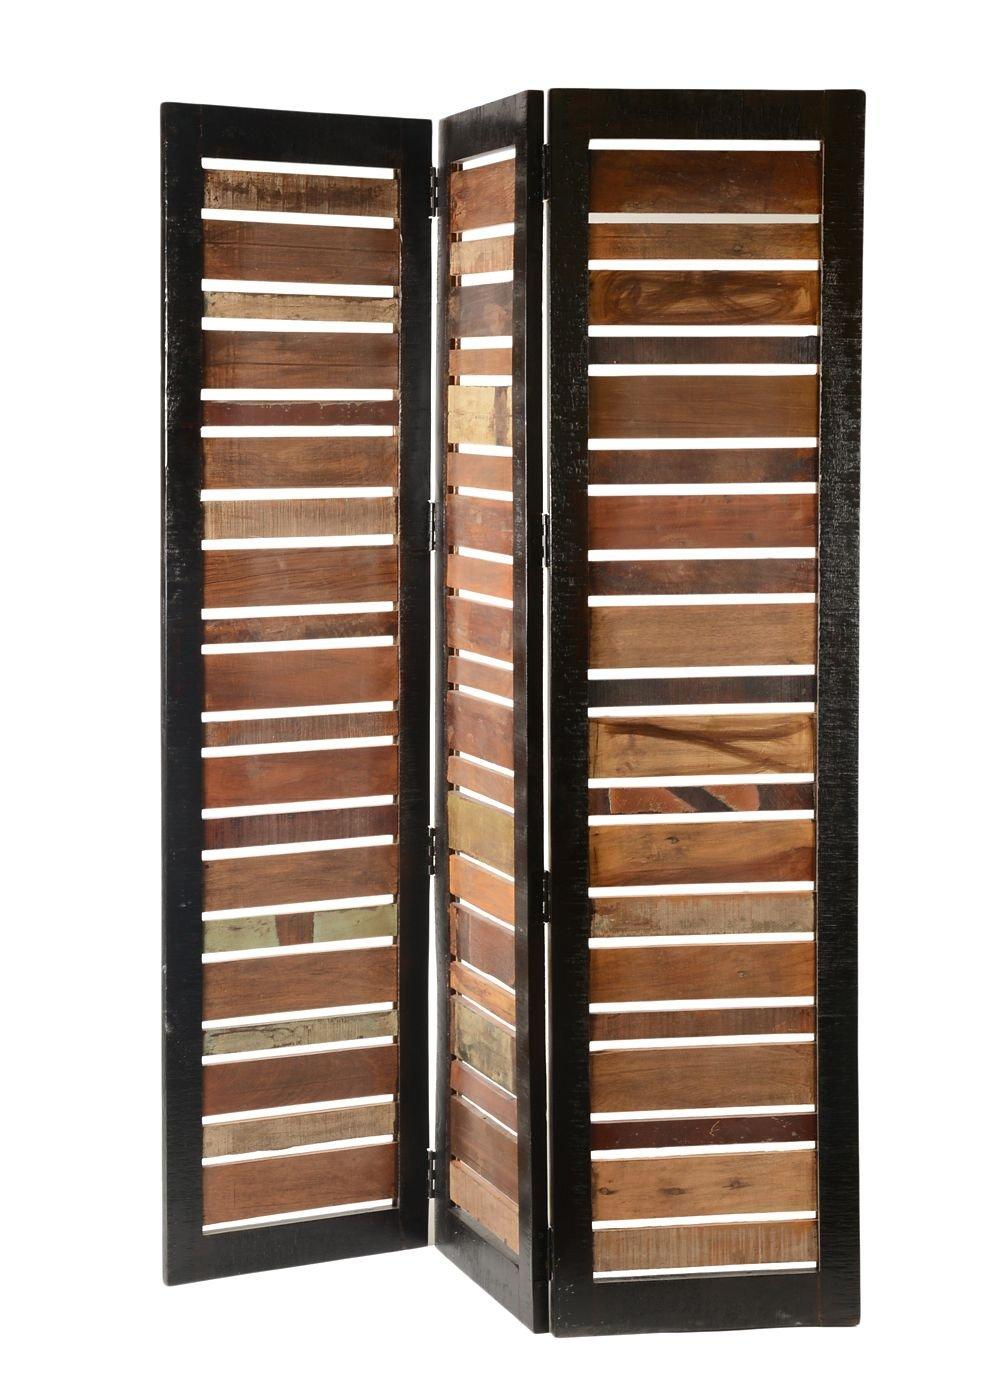 Gypsy Reclaimed Wood Screen Multi Dimensions: 55''W x 2''D x 70''H Weight: 51 lbs